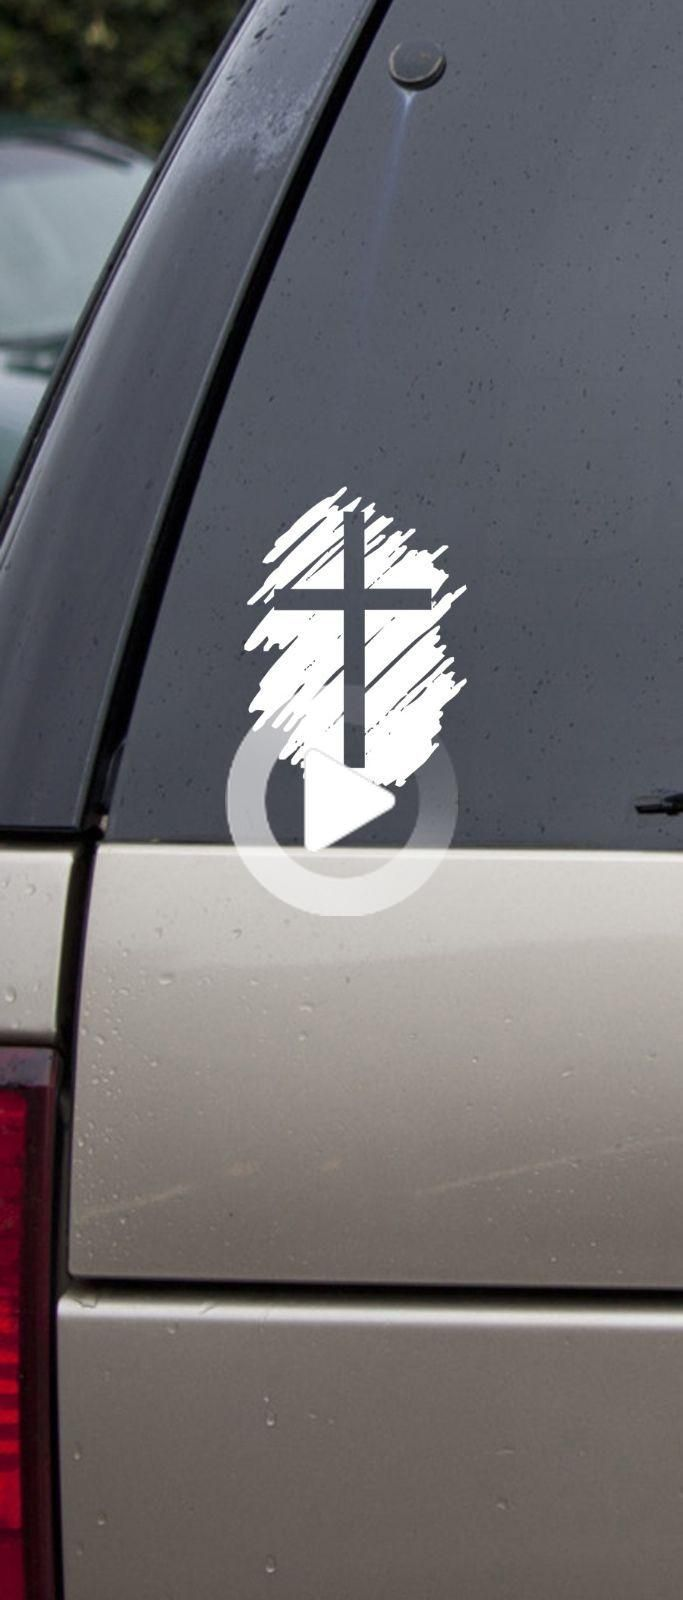 Cross Vinyl Decal Car Sticker Laptop Bible Lord Jesus Car Decals Vinyl Vinyl Decals Car Interior Accessories [ 1600 x 683 Pixel ]